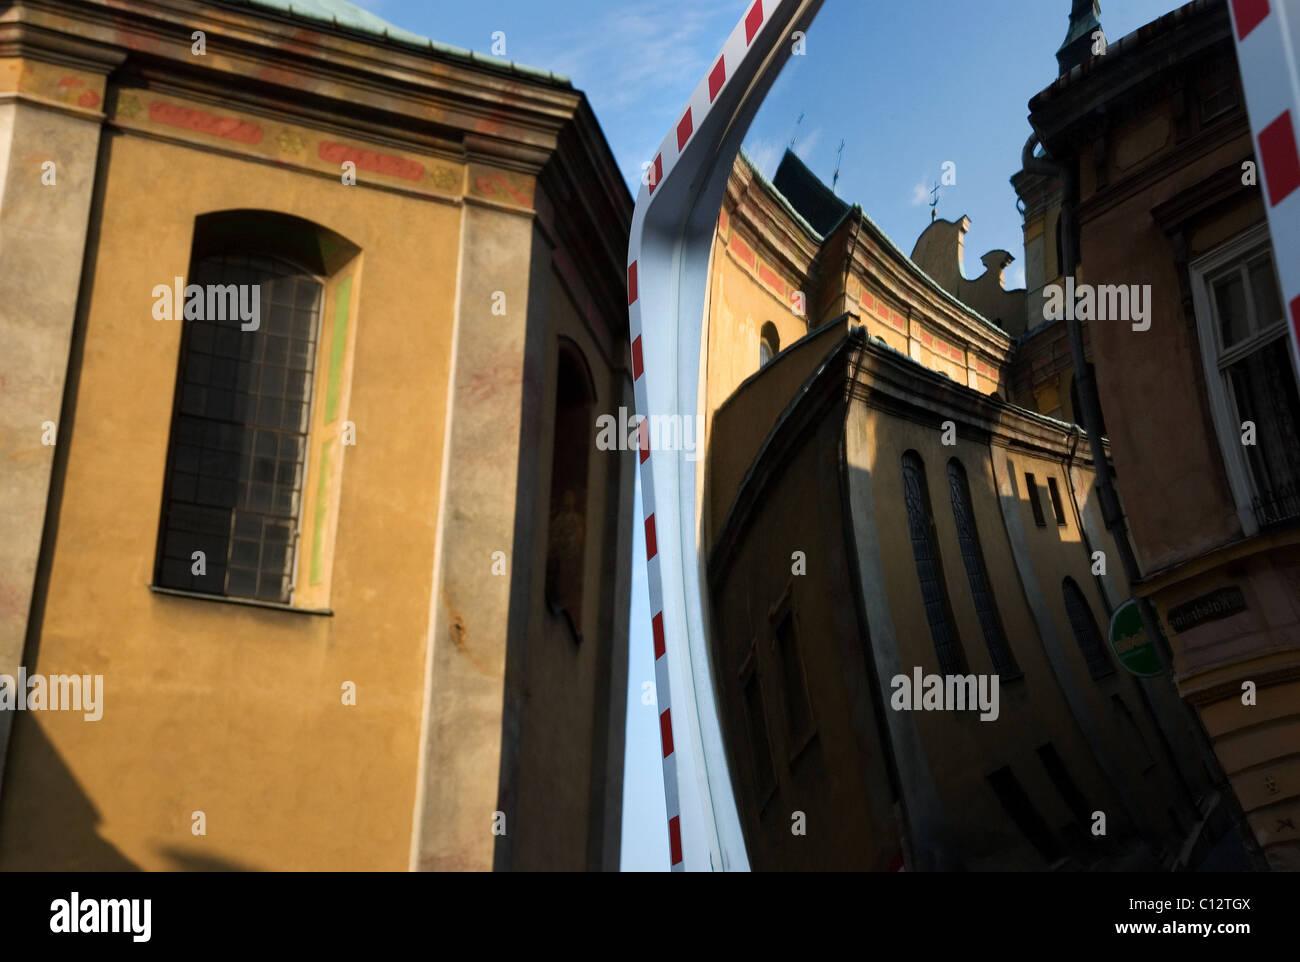 Building exterior distortion in Przemysl, Poland - Stock Image